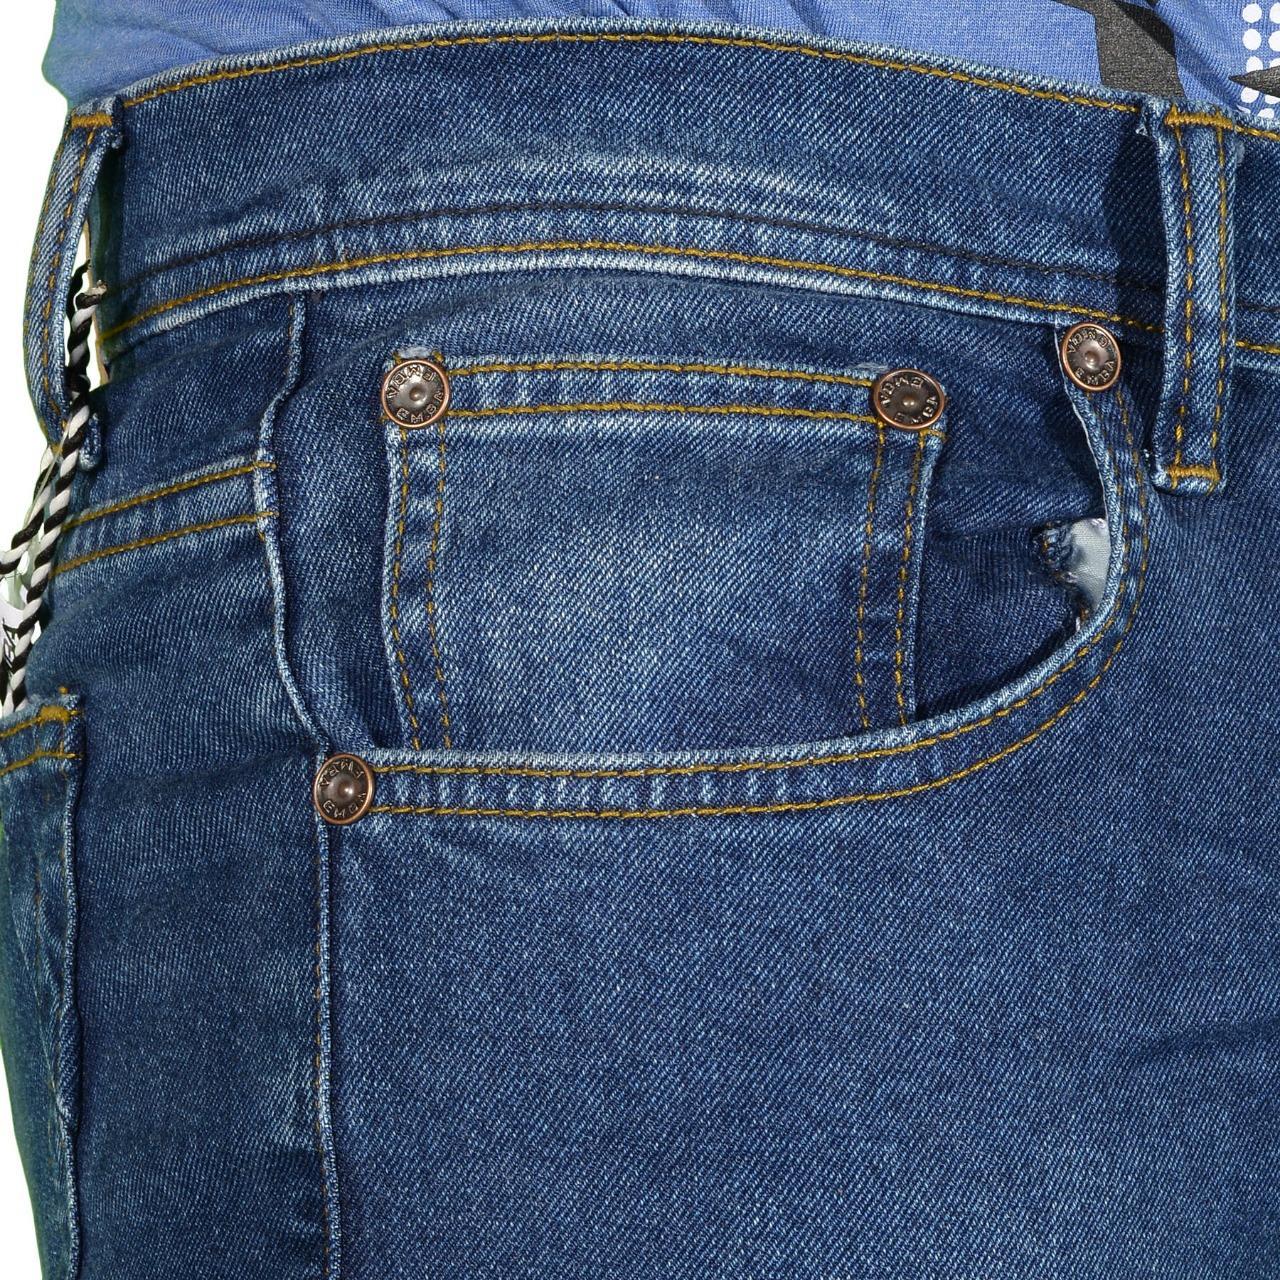 Emba Jeans Celana Panjang Pria Bs 08 Jordan Regular Grey Spec Dan Denosiq Denim Warna Heavy Stom 1 Abu 38 071 Morgan Slim 617 11204